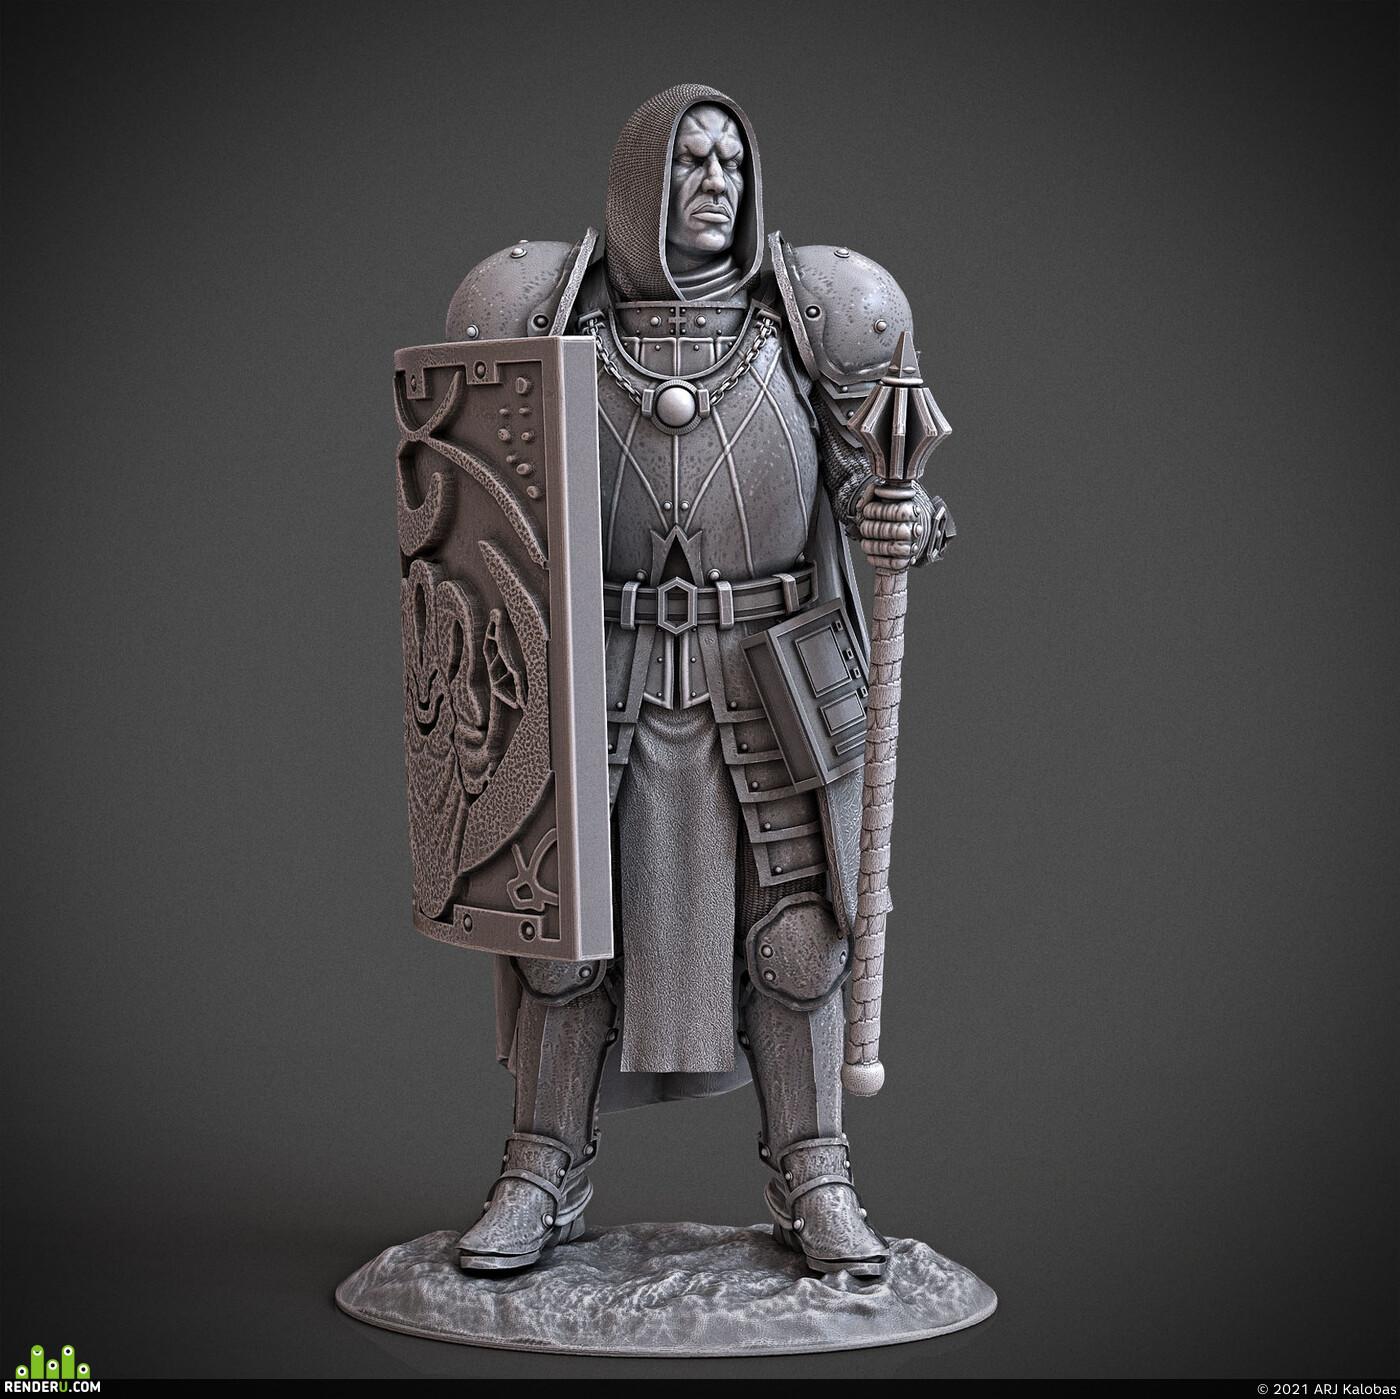 Digital 3D, 3D Printing, Fantasy, Board & Card Game Art, Character Modeling, miniature, arjkalobas, sculpt, 3dprint